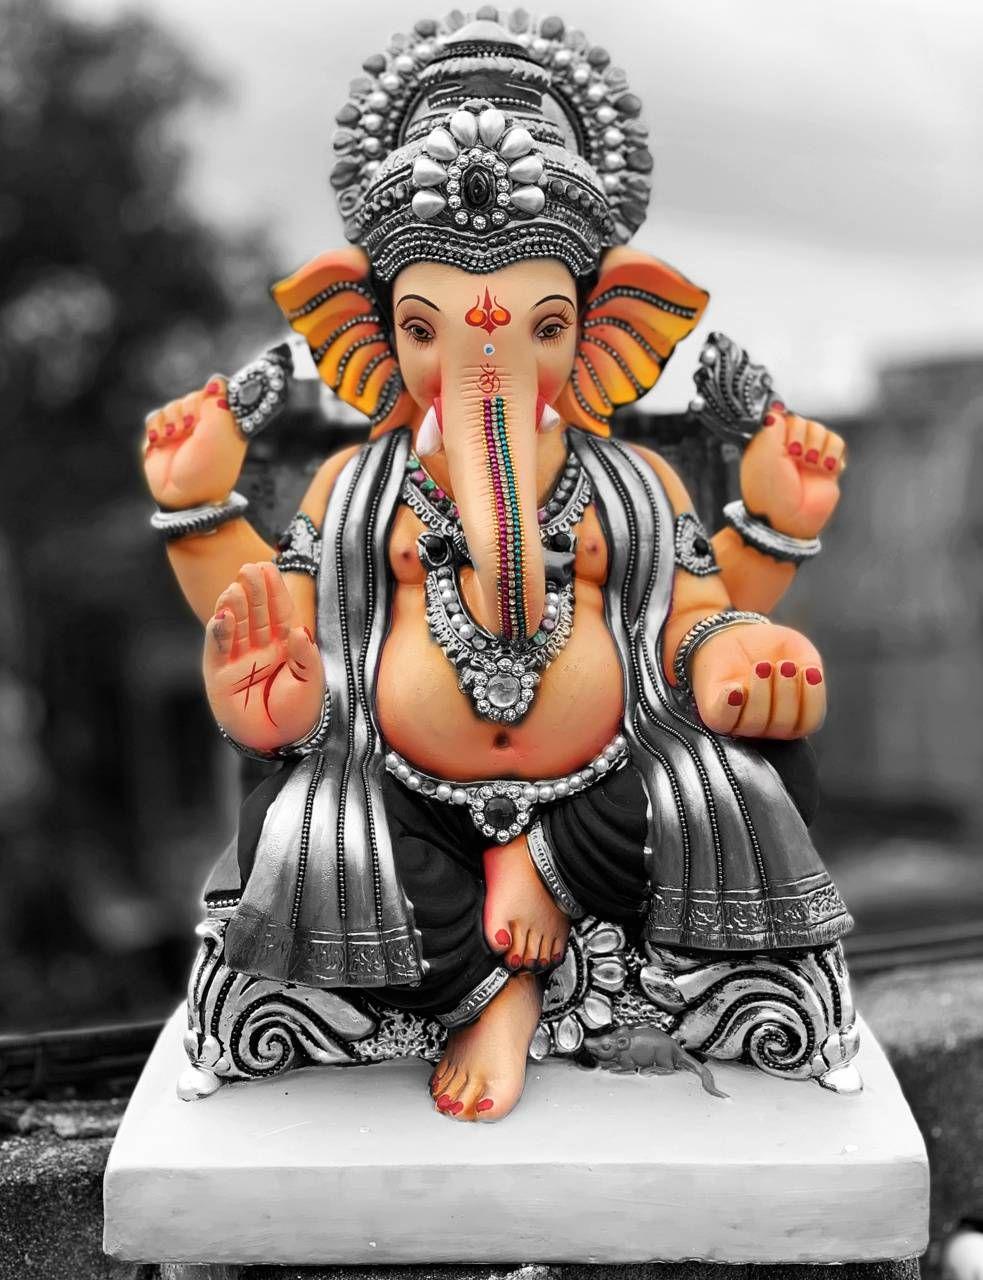 Download Ganesha Wallpaper By Sinhalchirag 6e Free On Zedge Now Browse Millions Of Popular Ganesh Wa Ganesh Wallpaper Ganesh Photo Happy Ganesh Chaturthi Ganpati wallpaper hd download